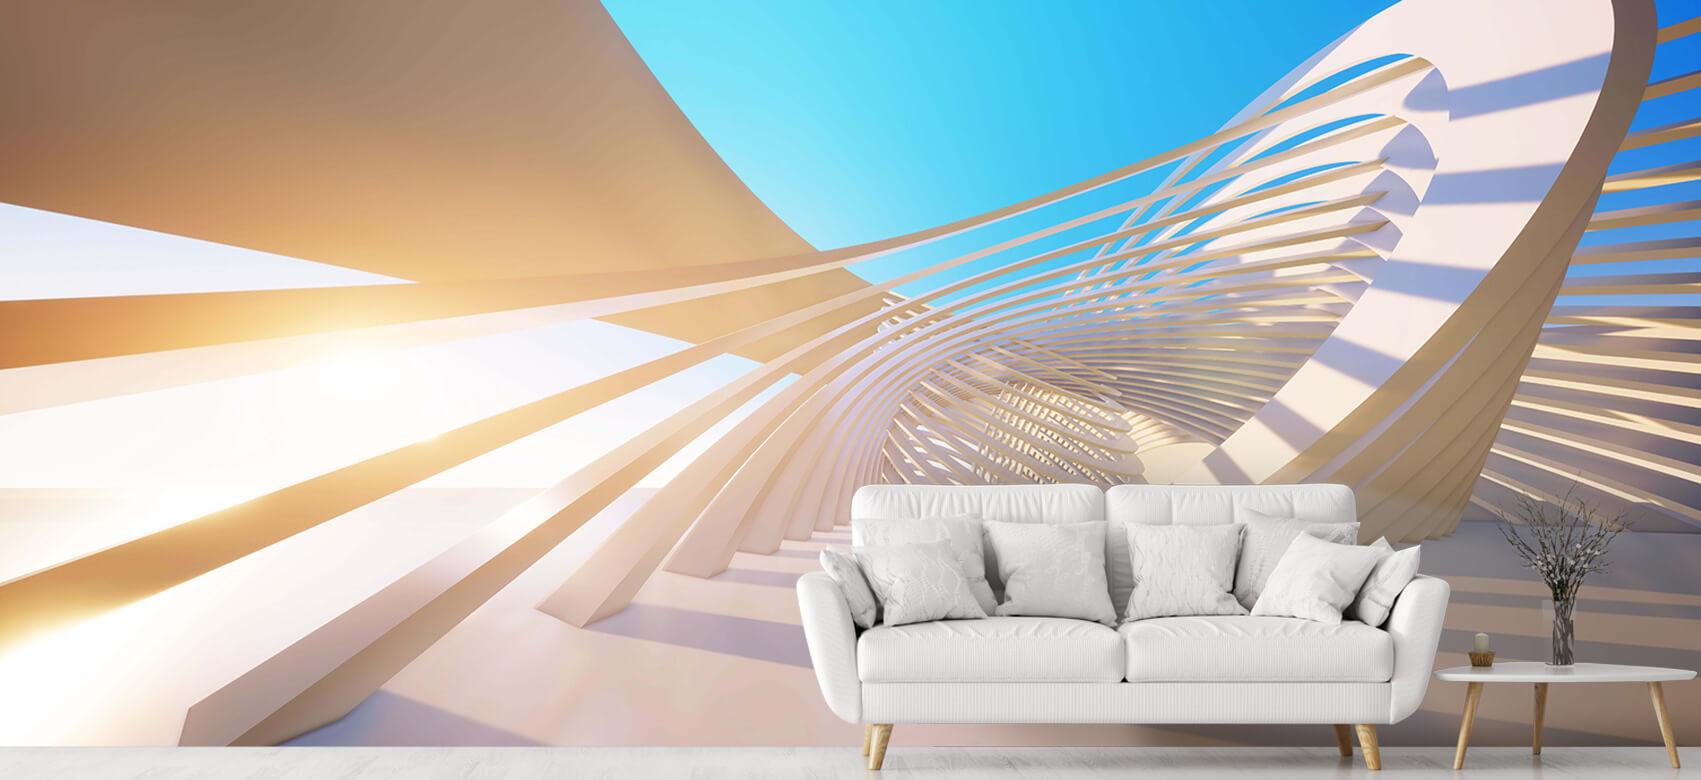 3D Anneaux abstraits 6